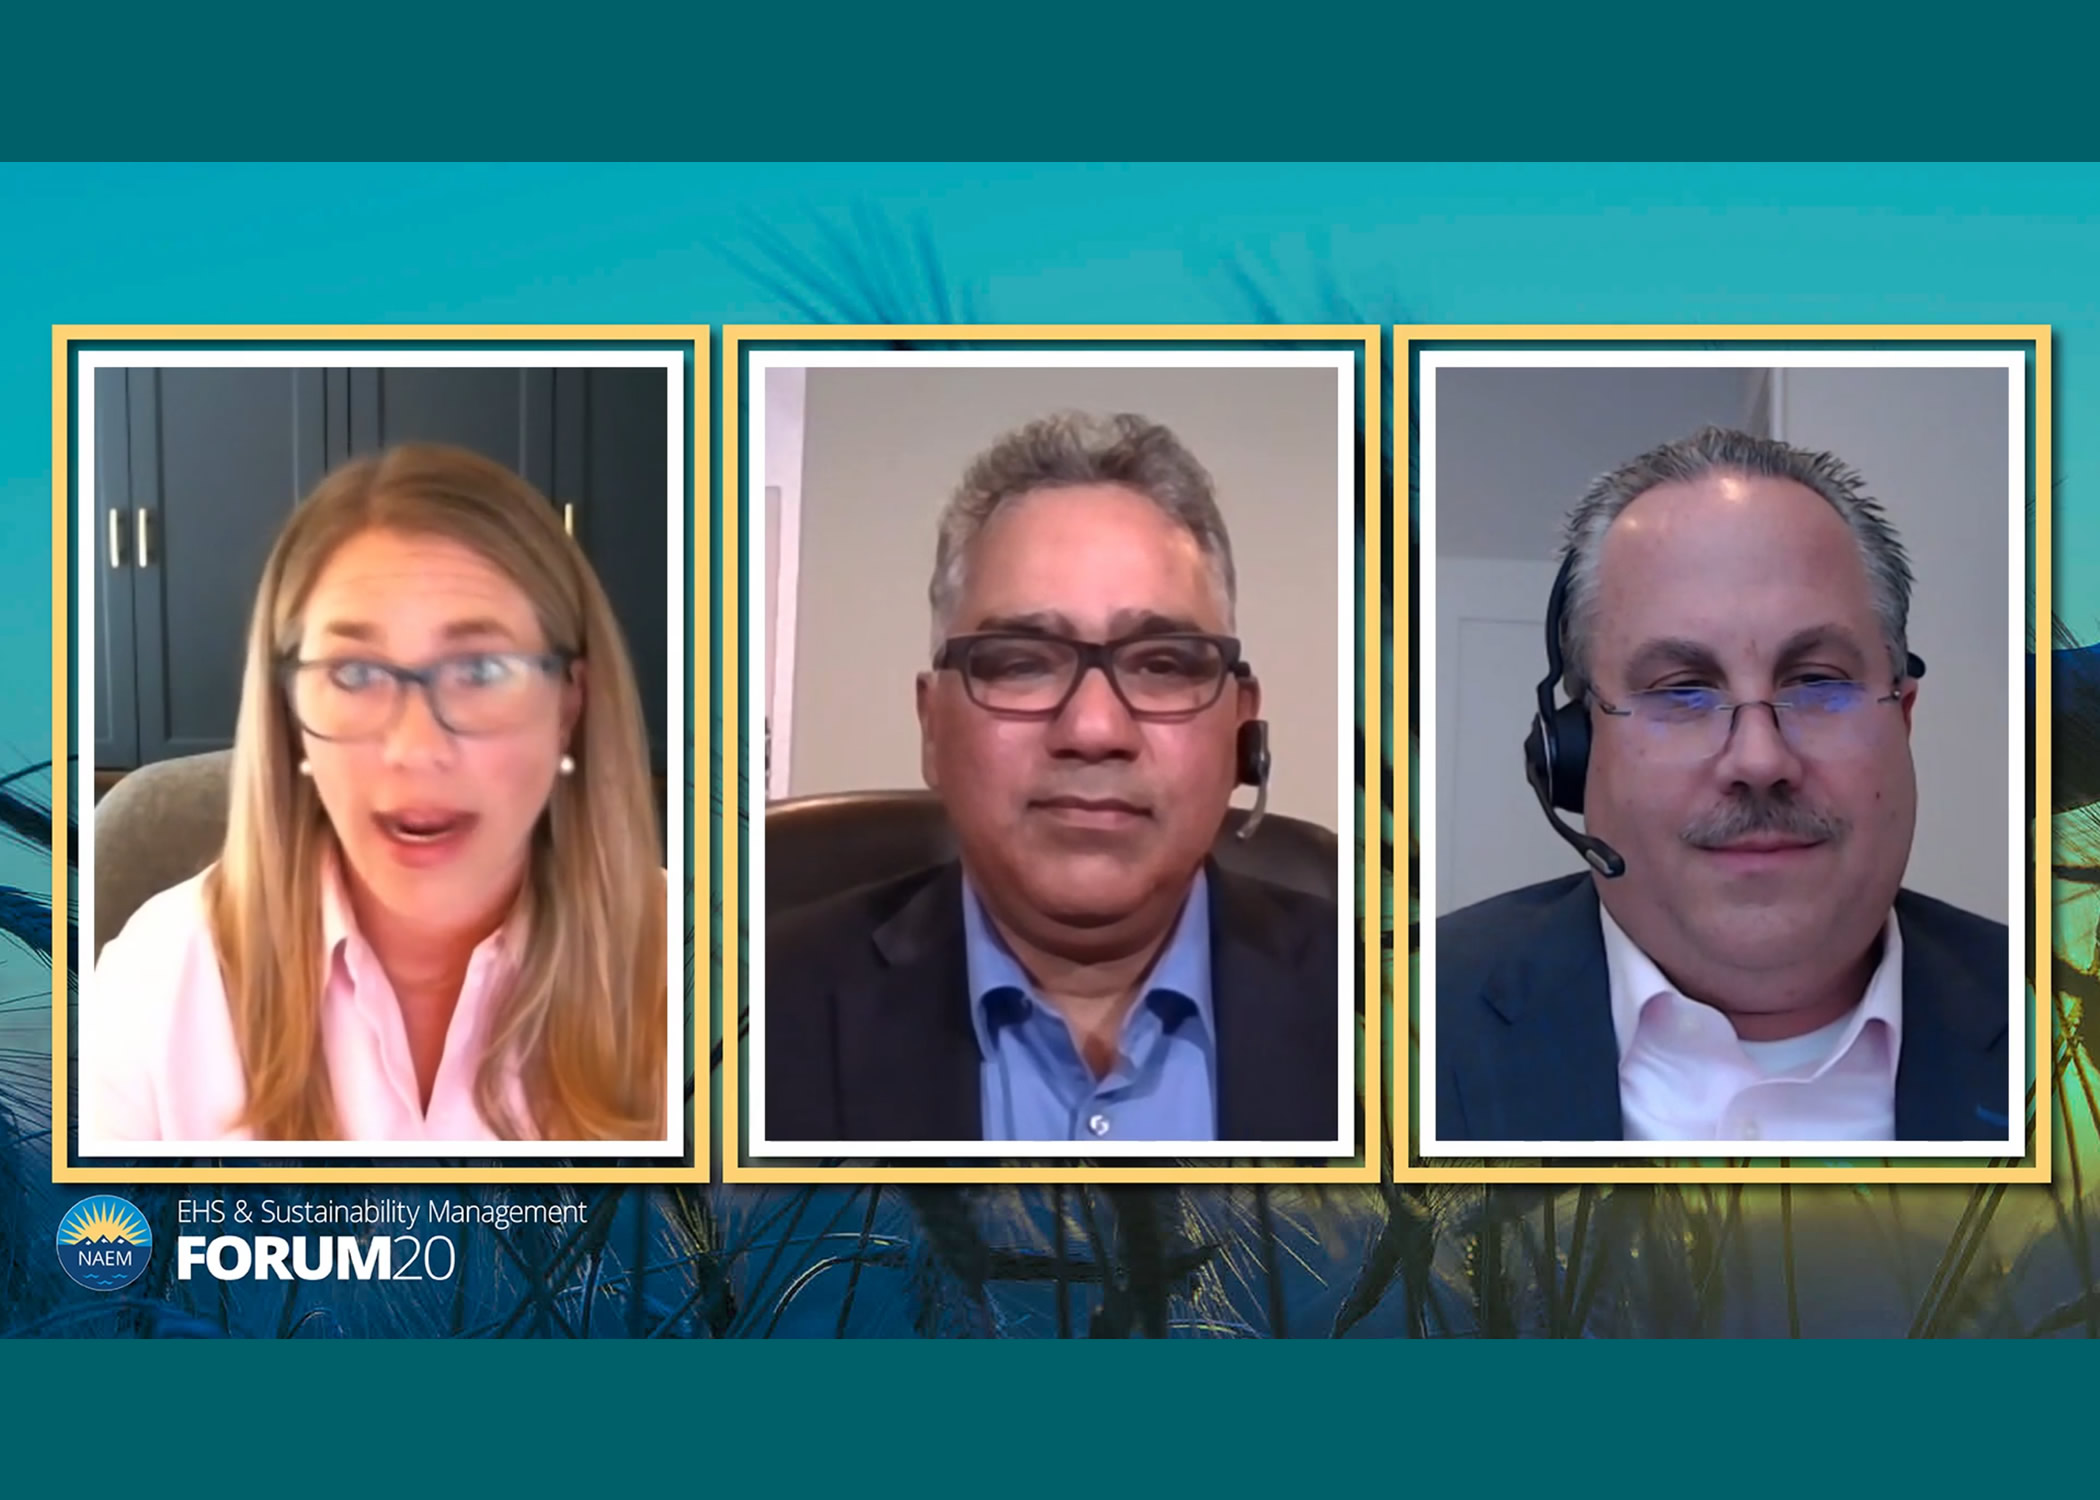 2020 EHS&S Forum - Lara Malatesta, Allan Fernandes, Jon Kipp